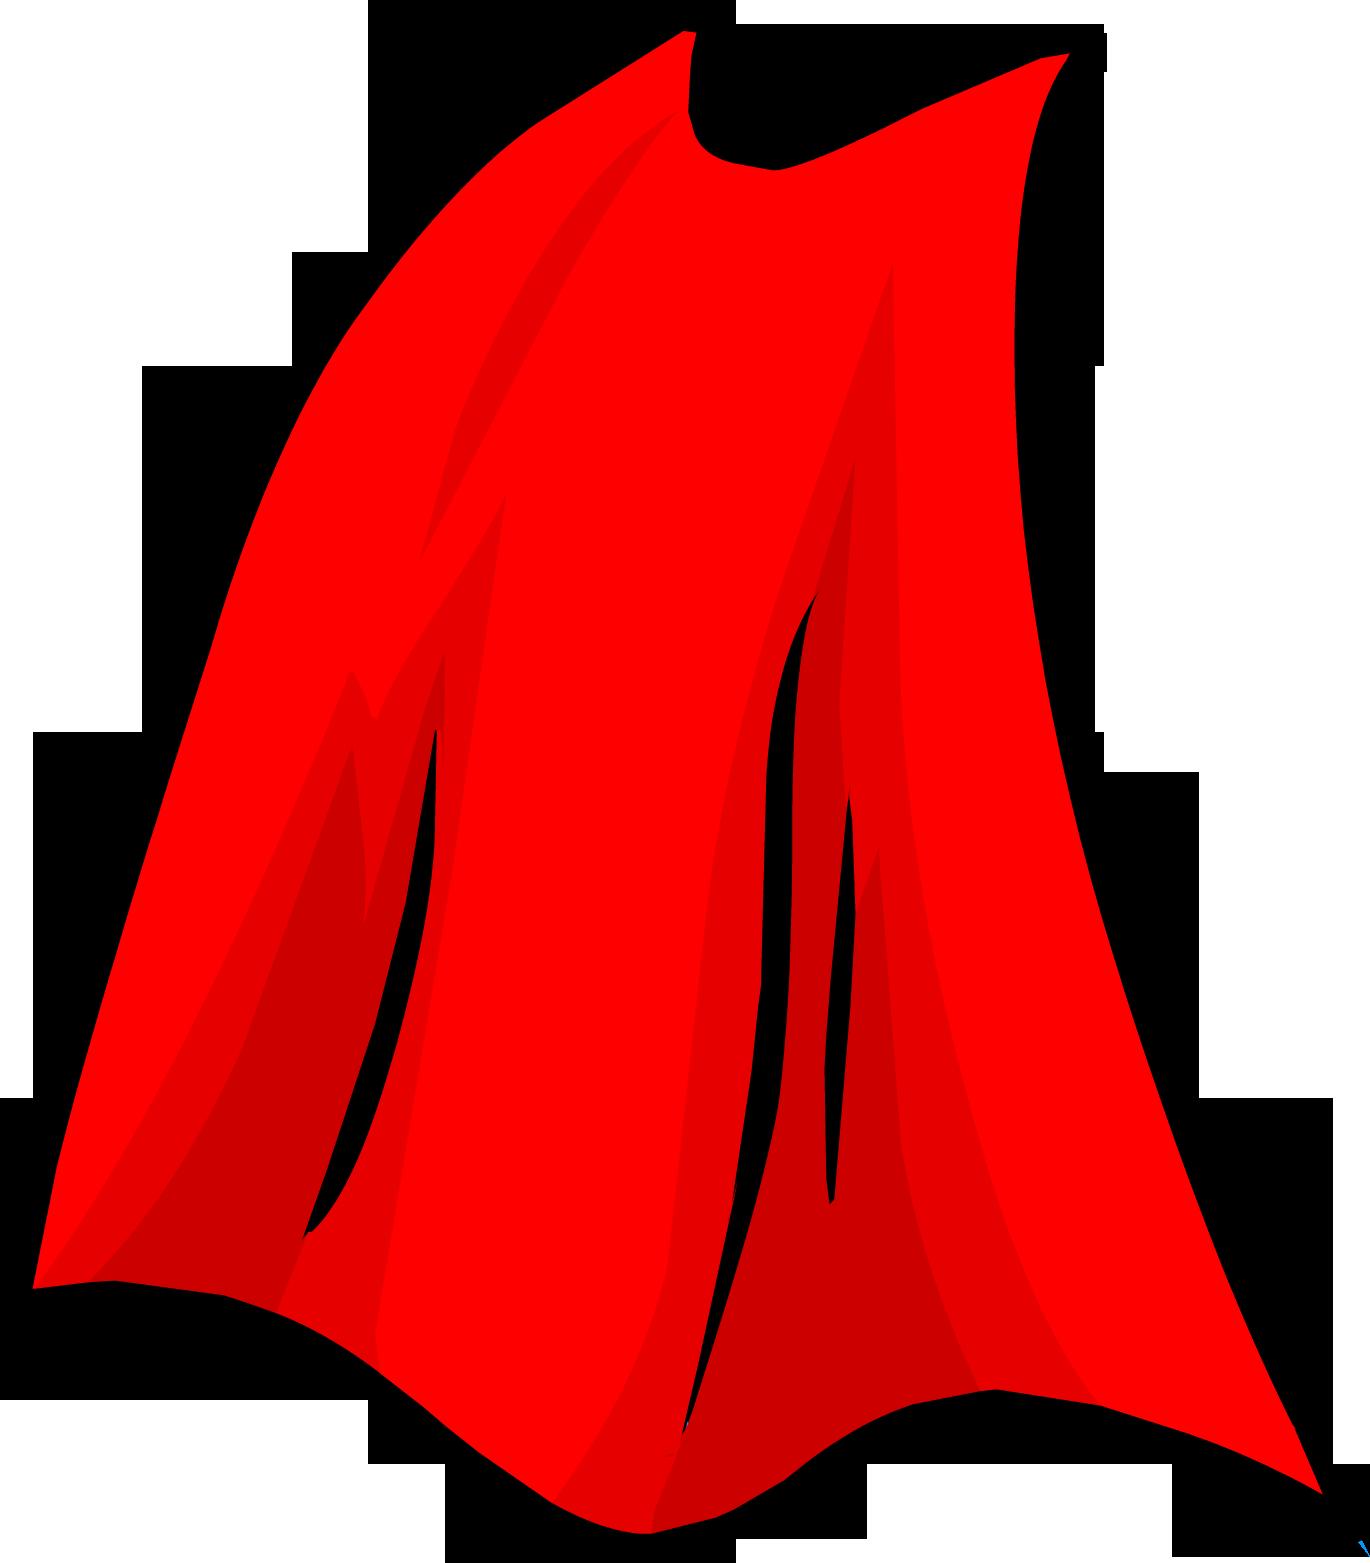 Superhero Cape Clipart.